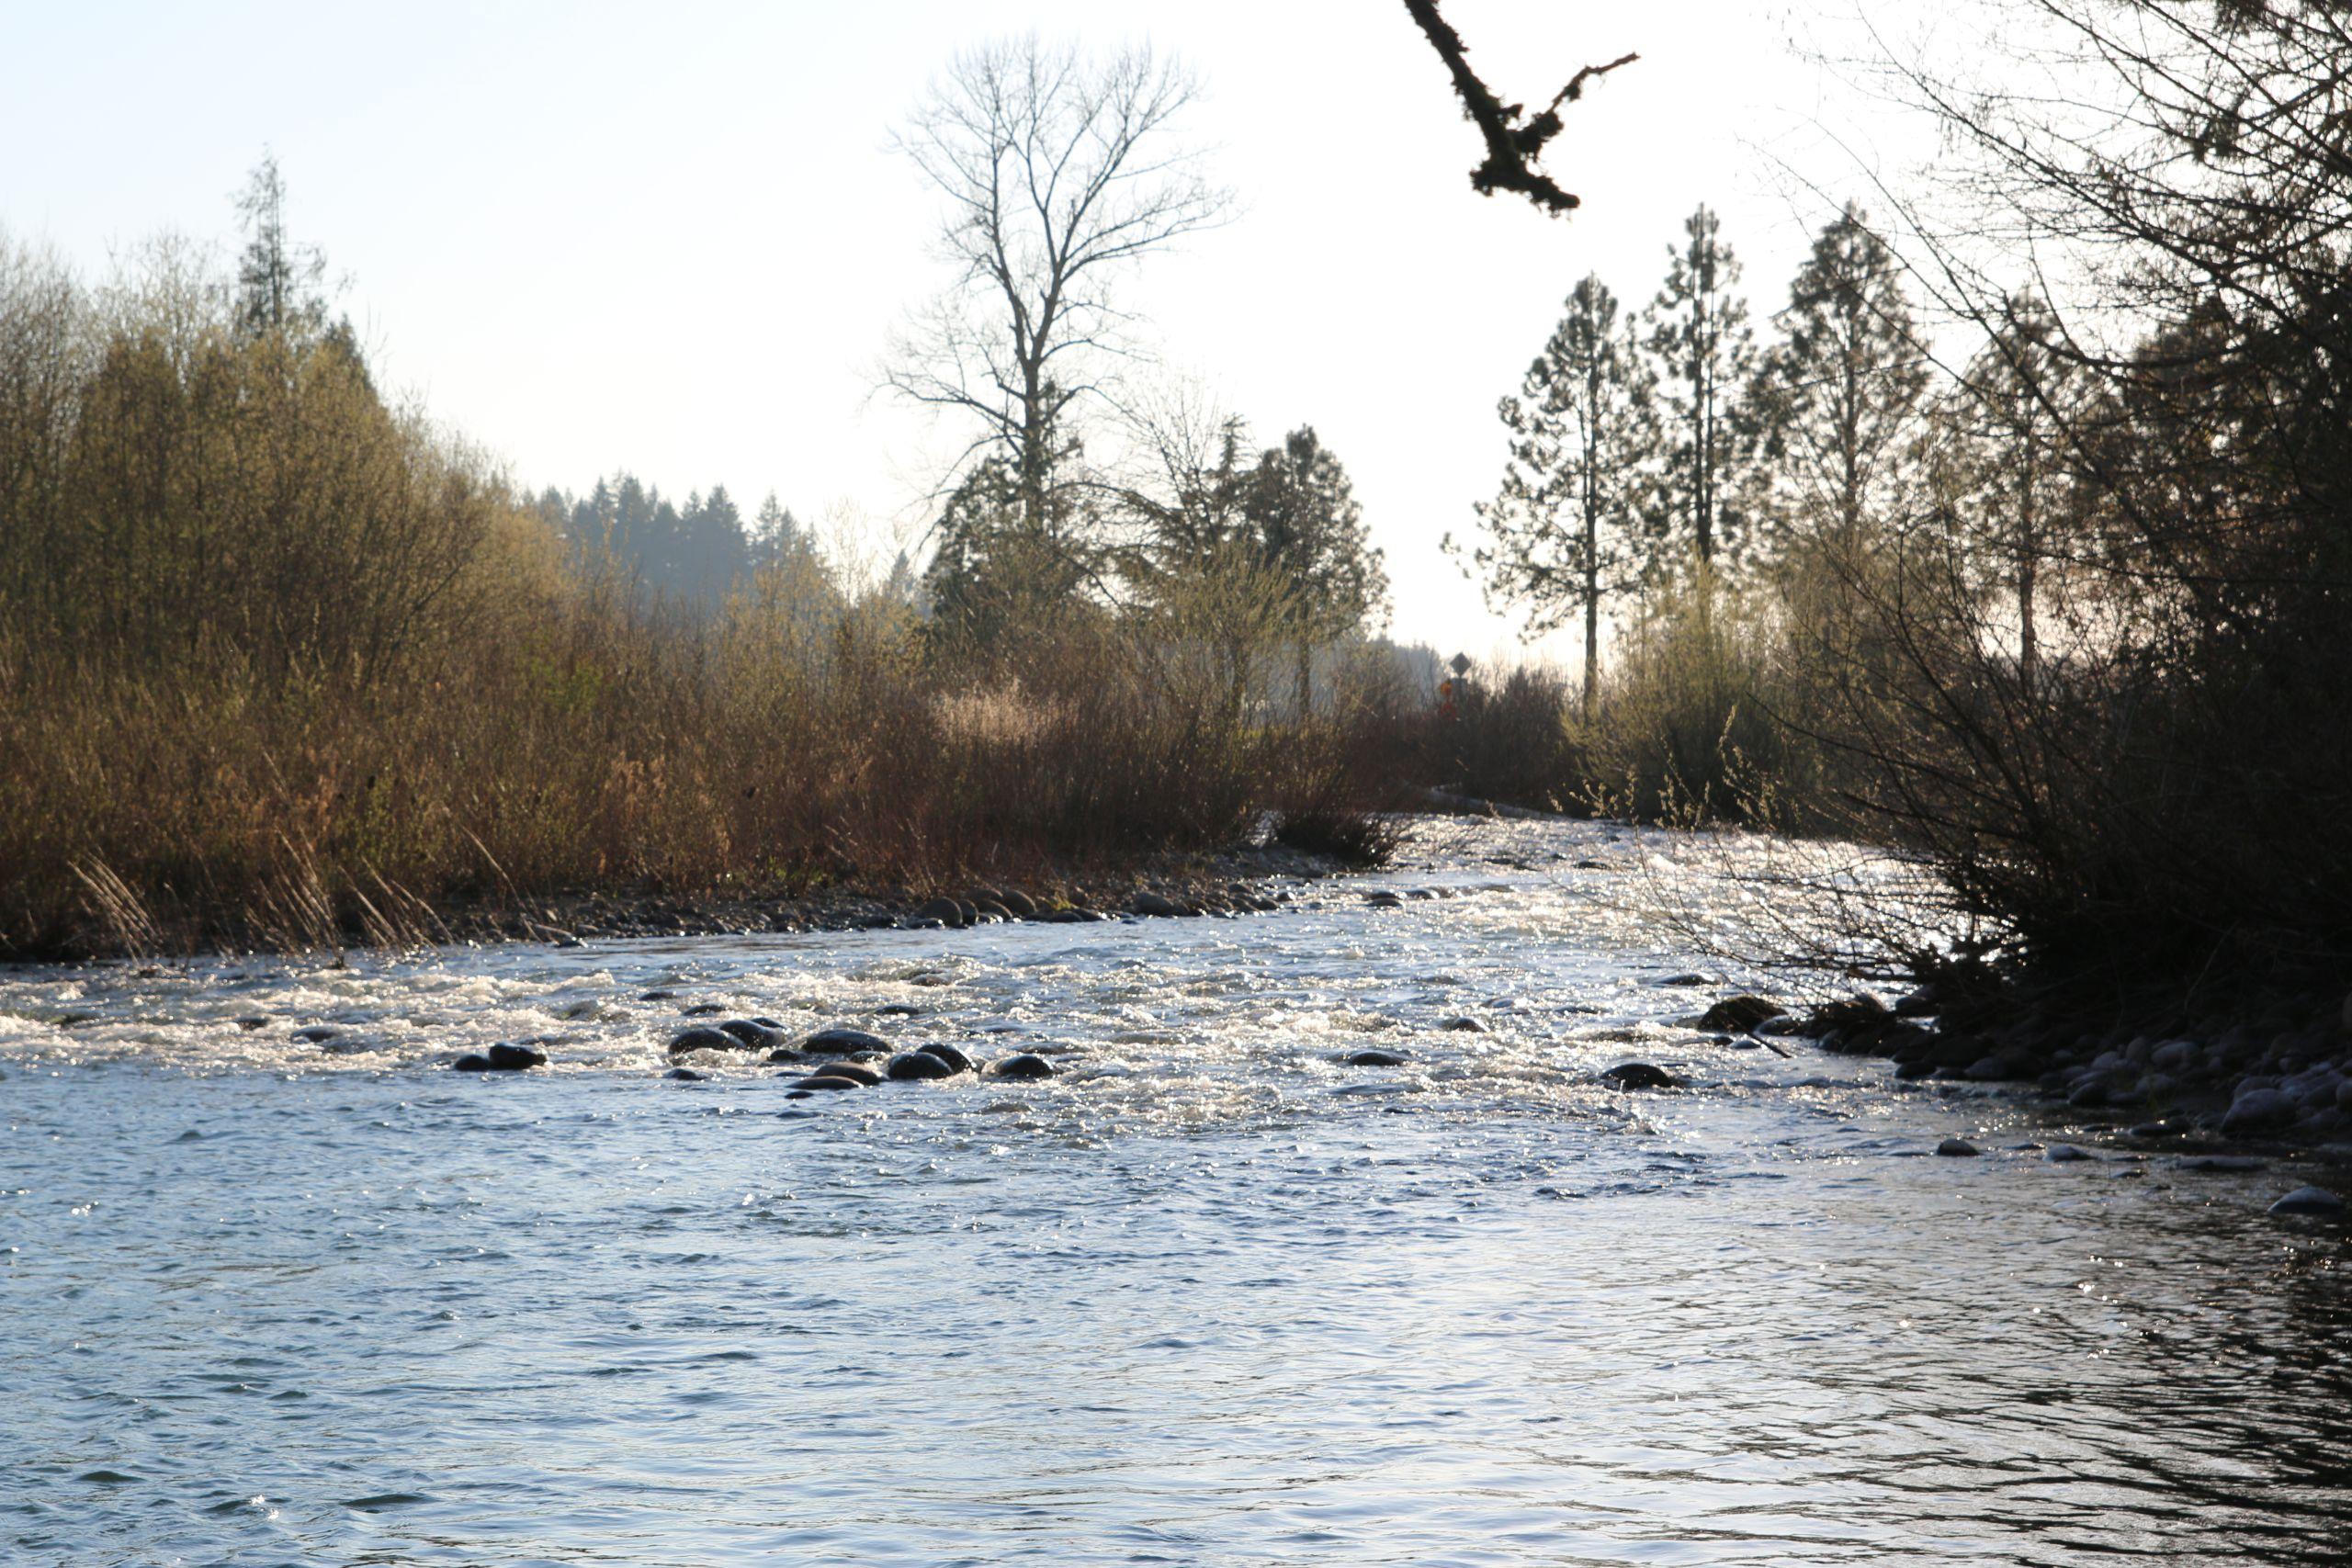 Crabtree Creek, Oregon